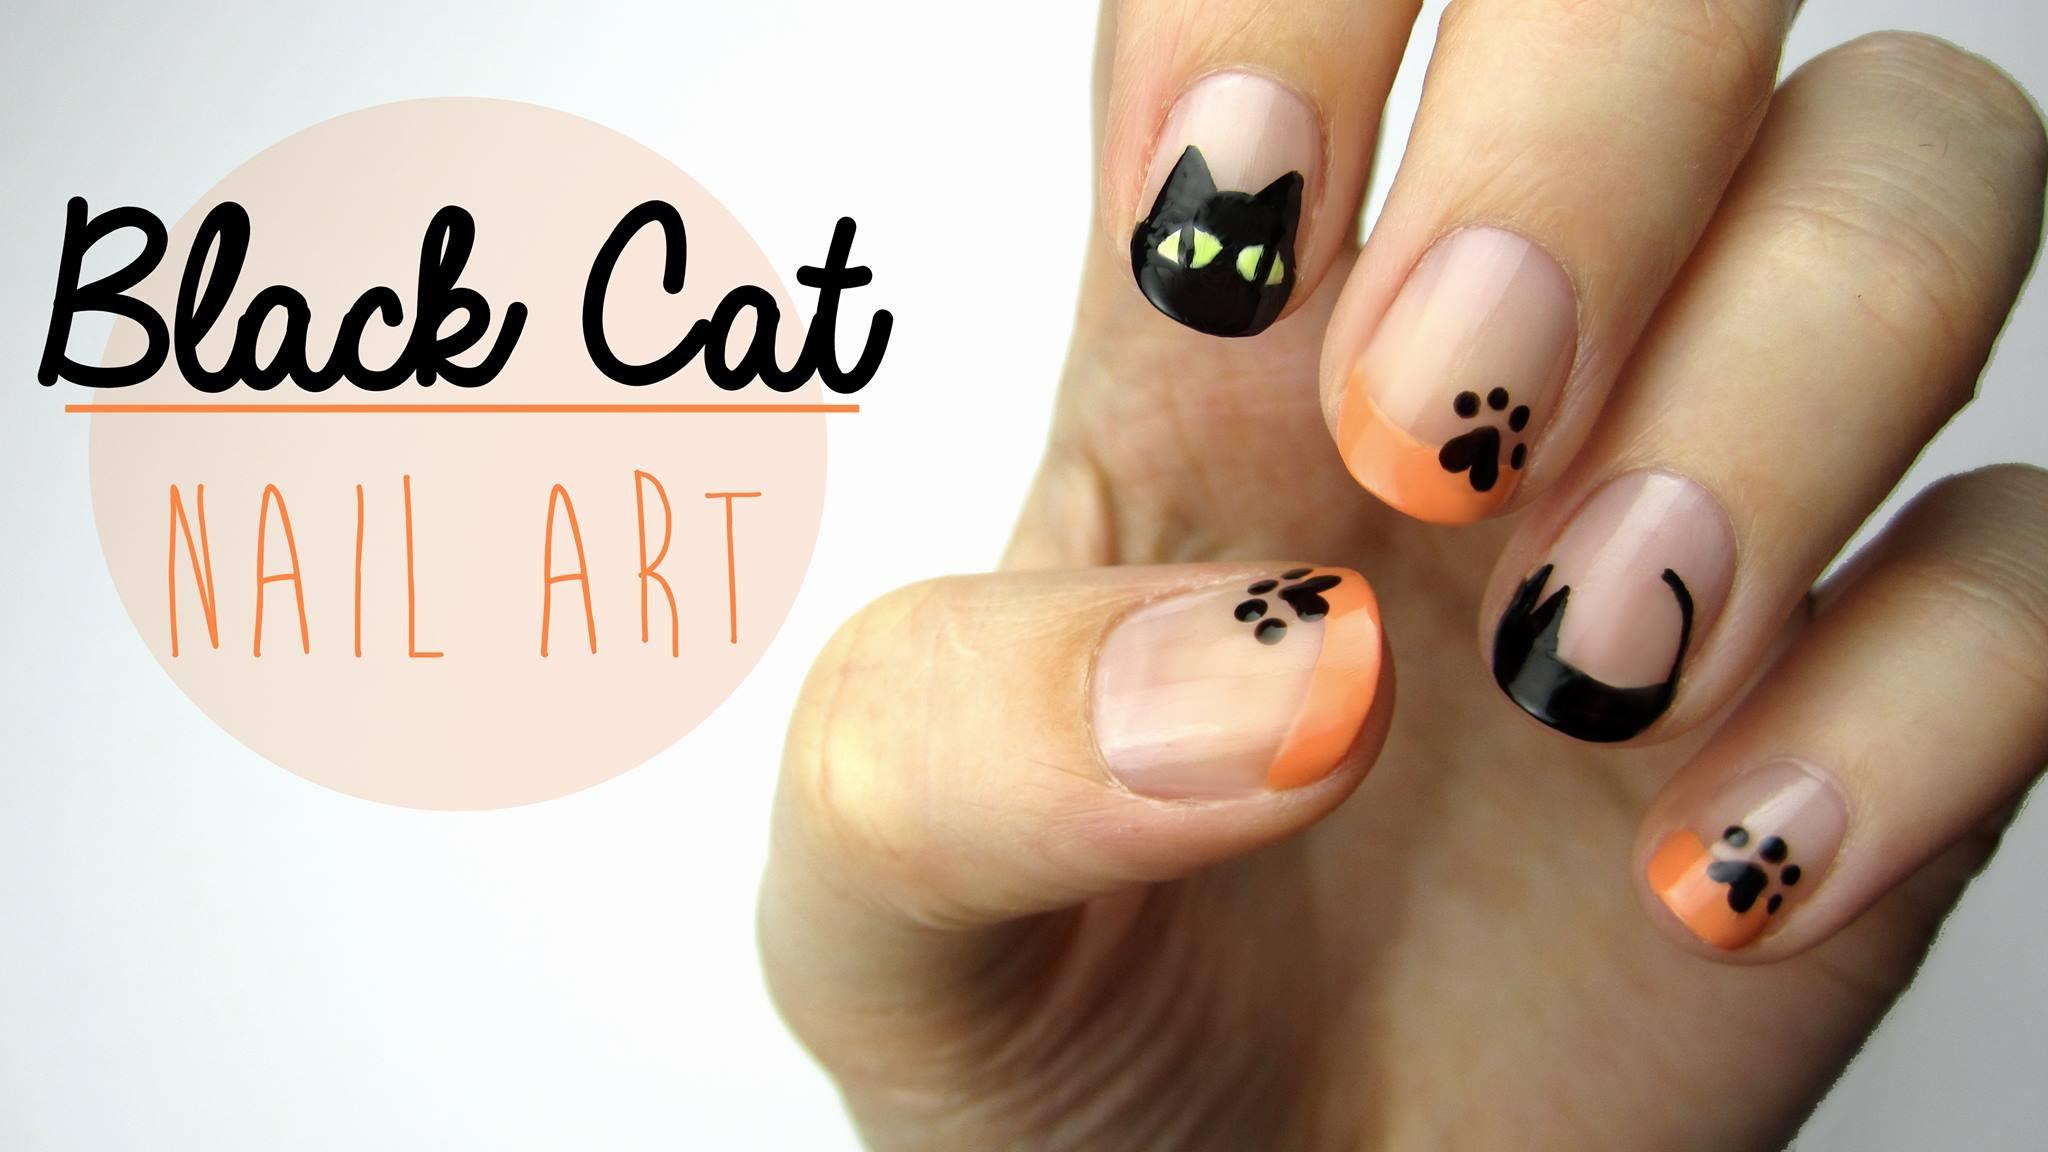 Drawn nail cat Design Cat Black  Art: